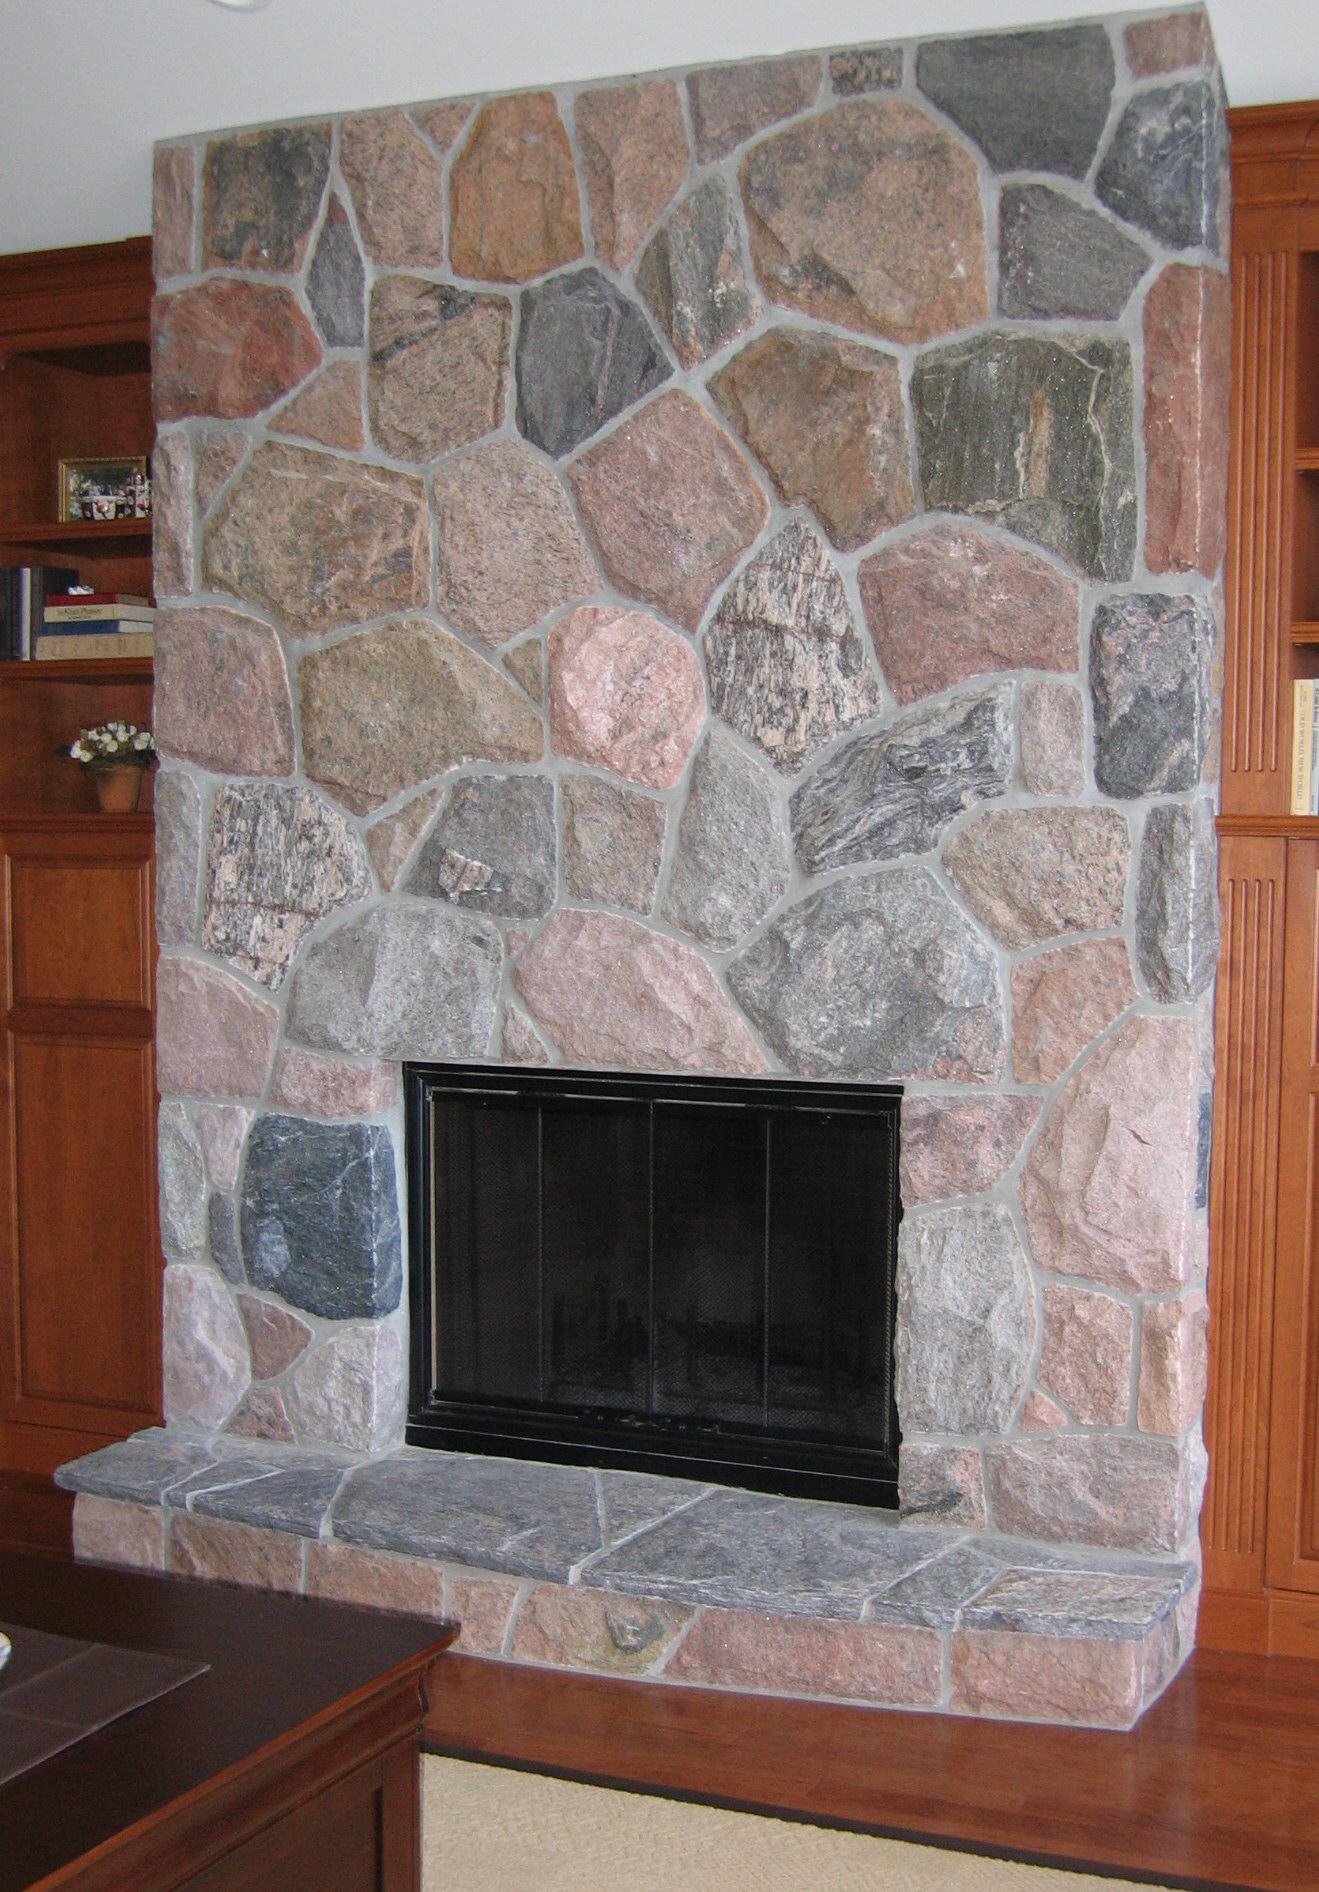 ... split fieldstone random indoor fireplace & EWM Indoor Fireplaces \u2013 Colonial Brick \u0026 Stone Inc.